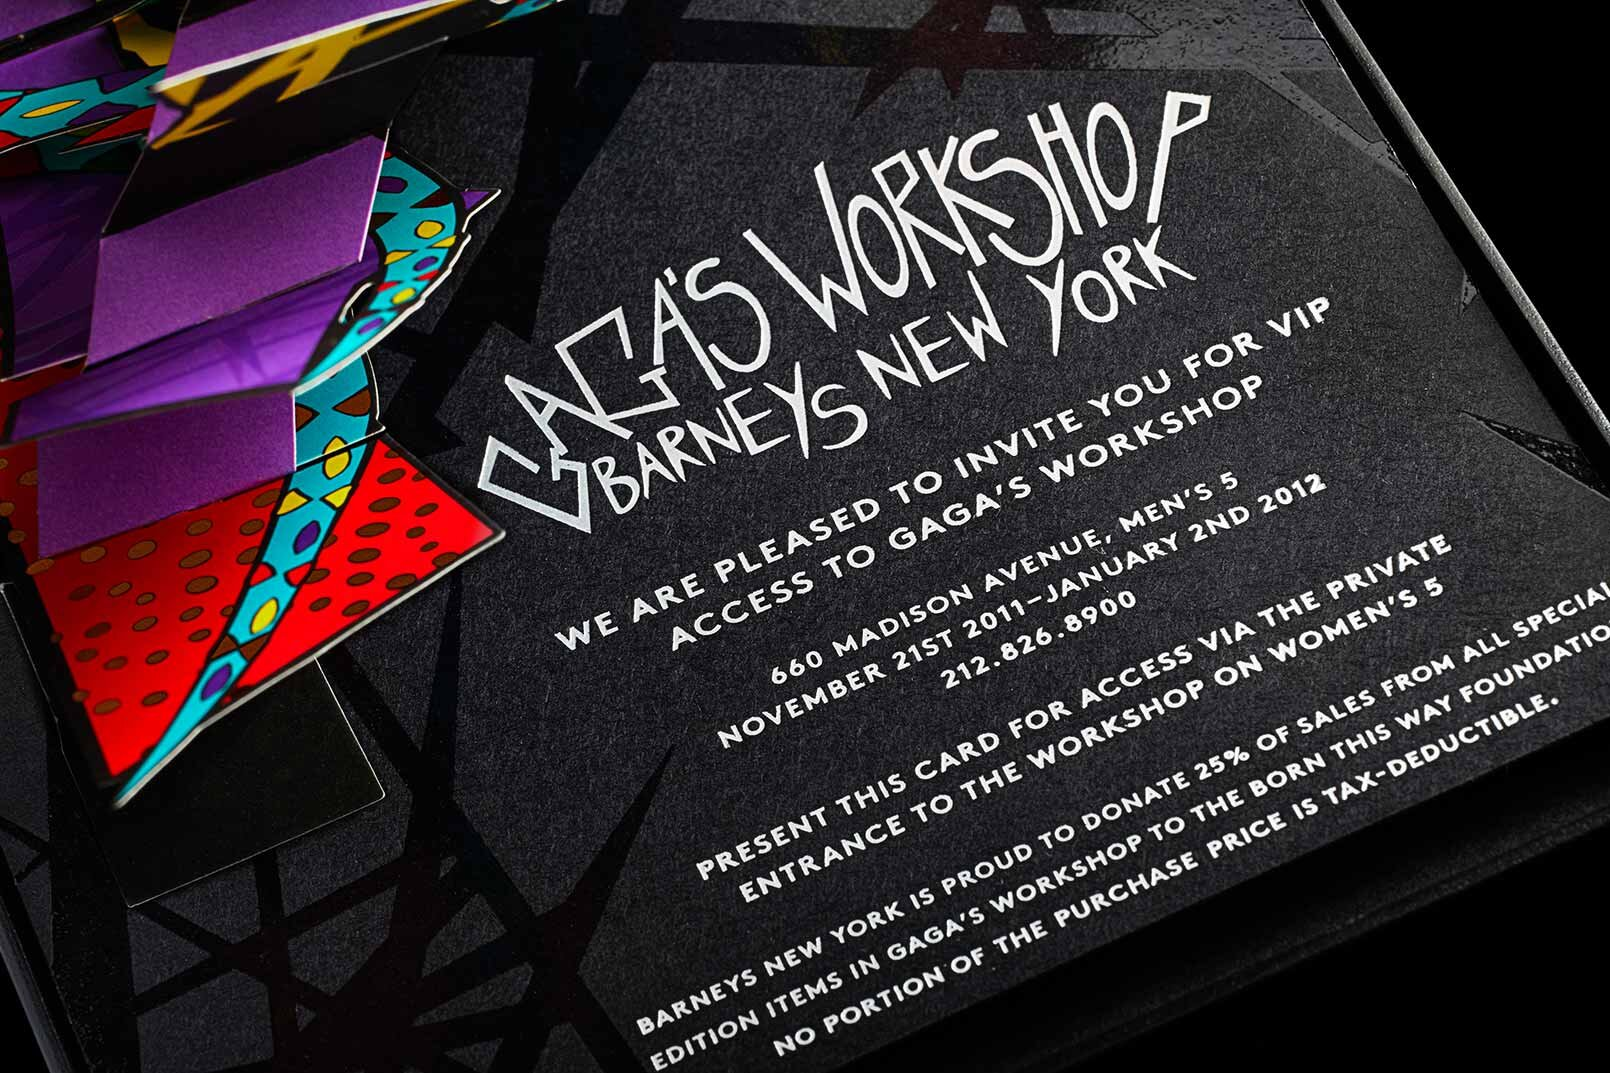 Barneys-New-York-Holiday-Lady-Gaga-Worskshop-Design-Packaging-Company-2.JPG